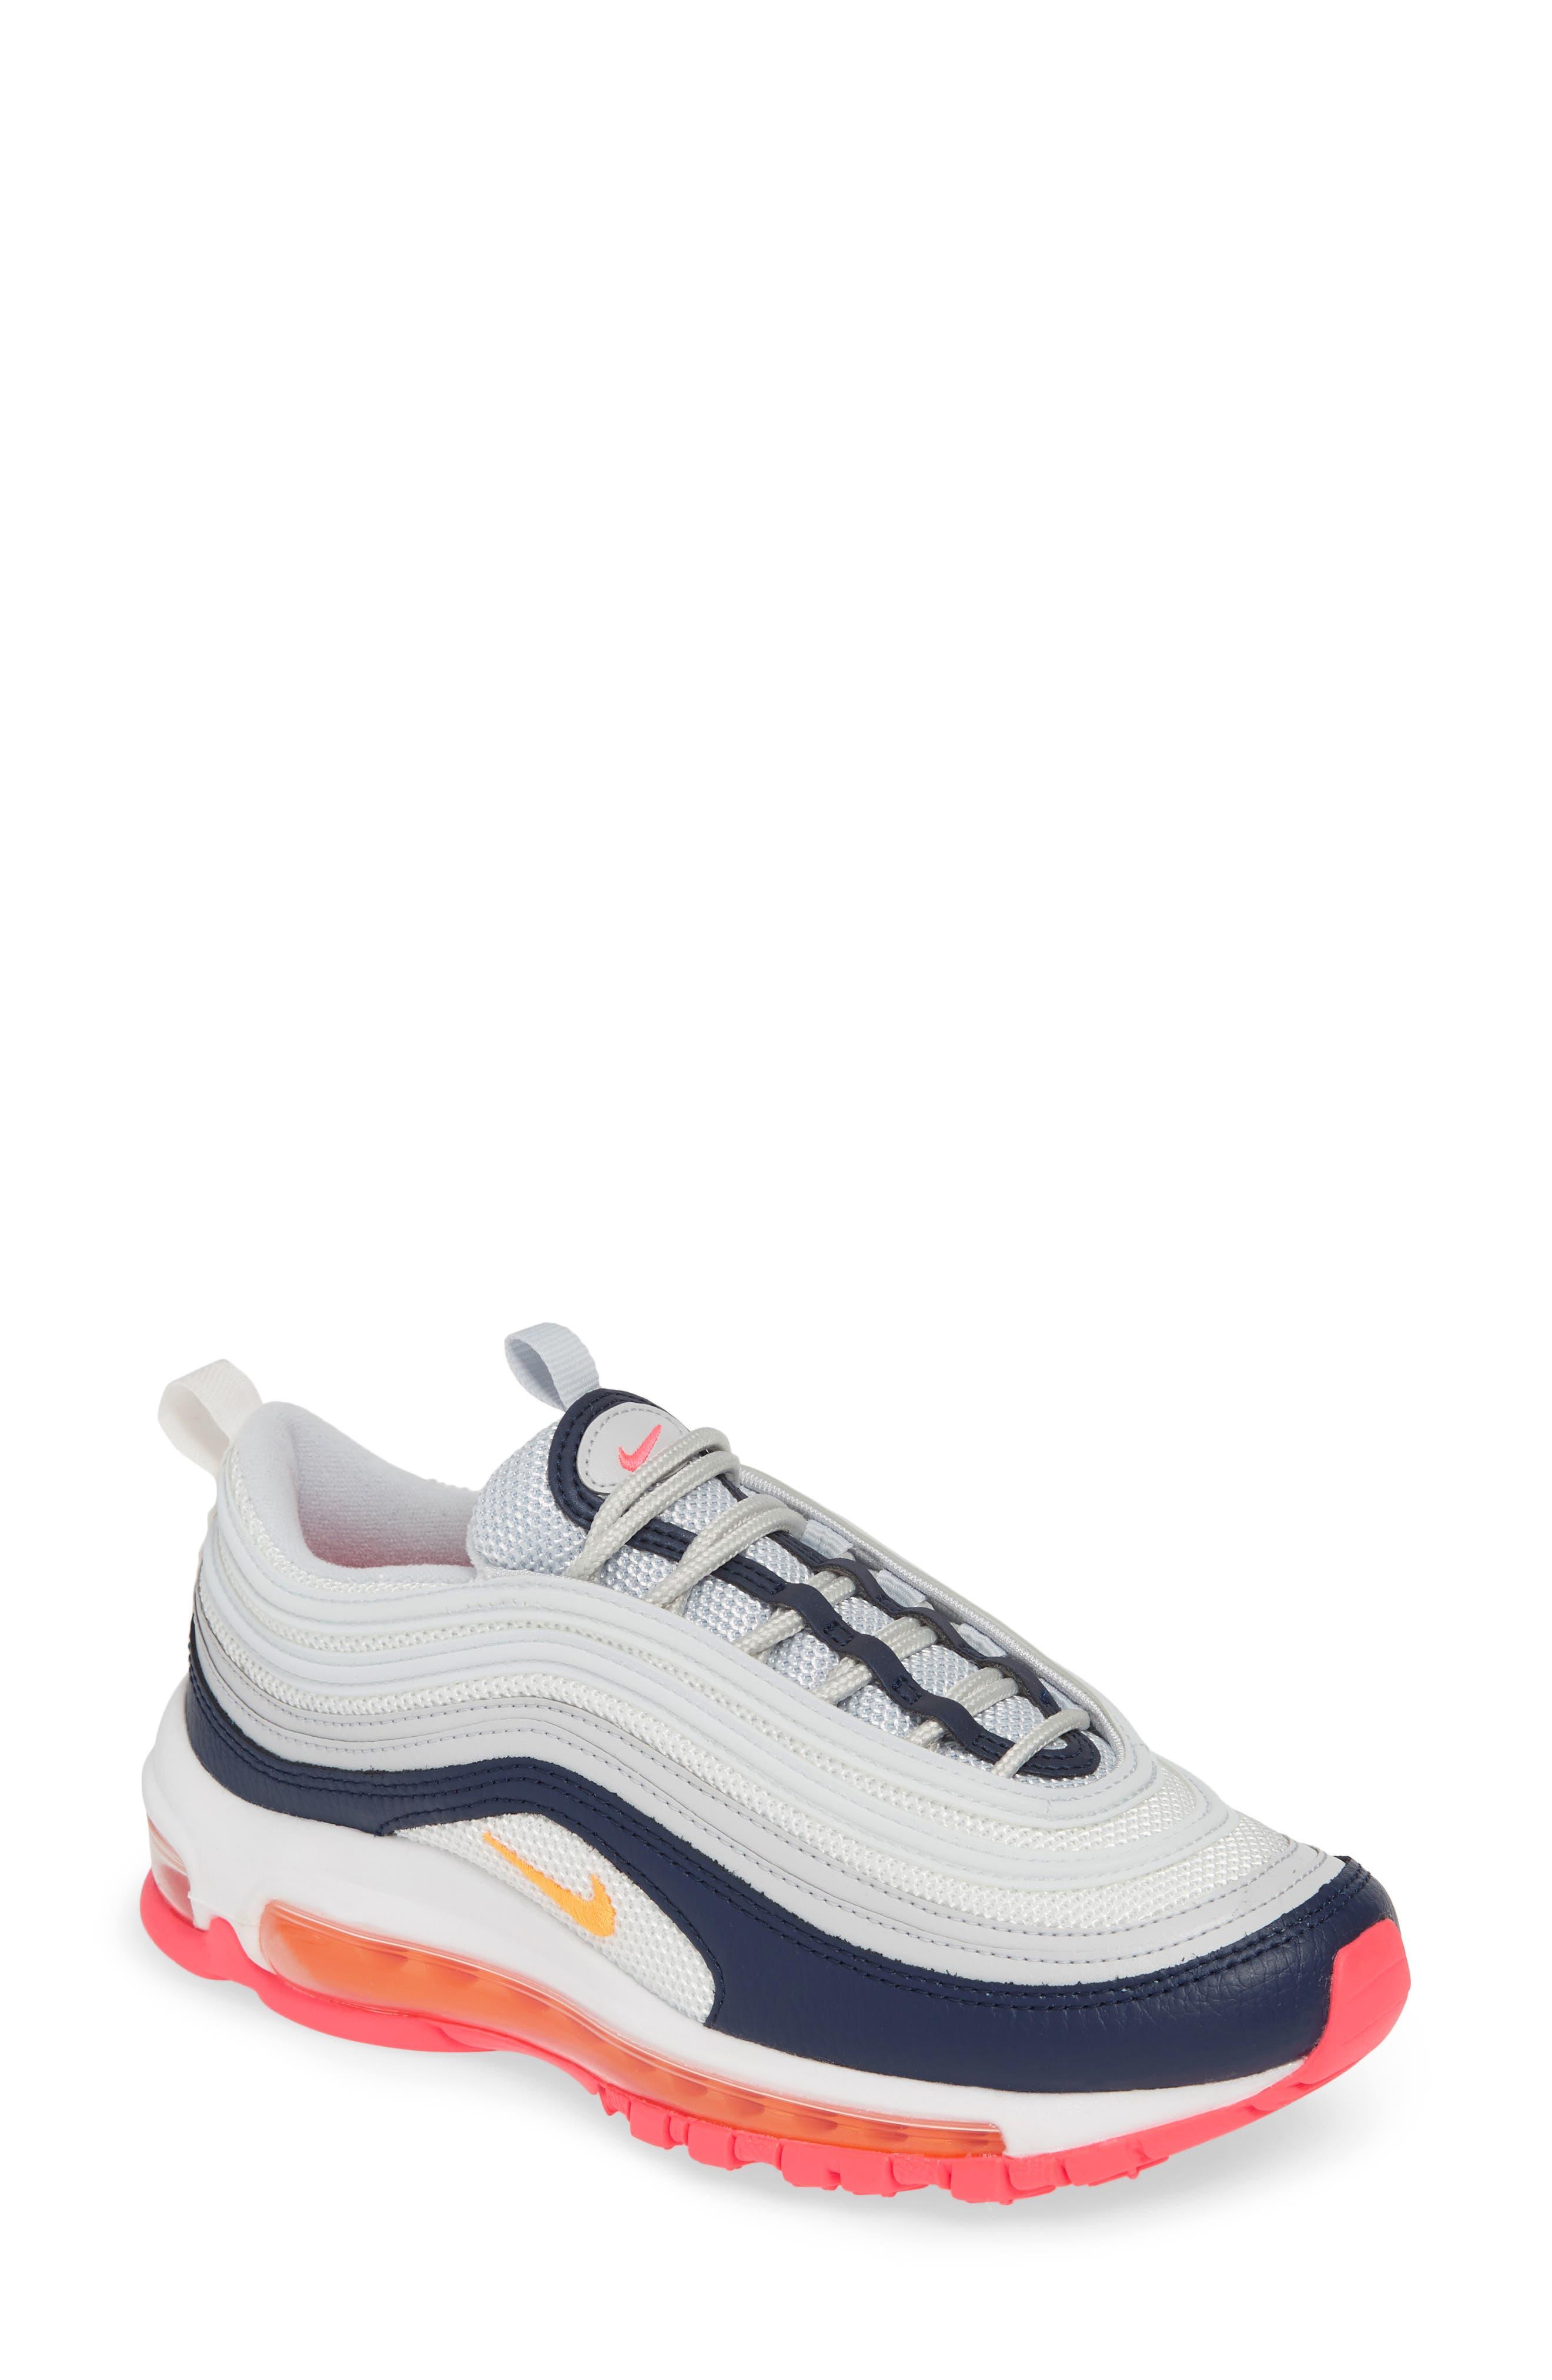 Air Max 97 Sneaker by Nike